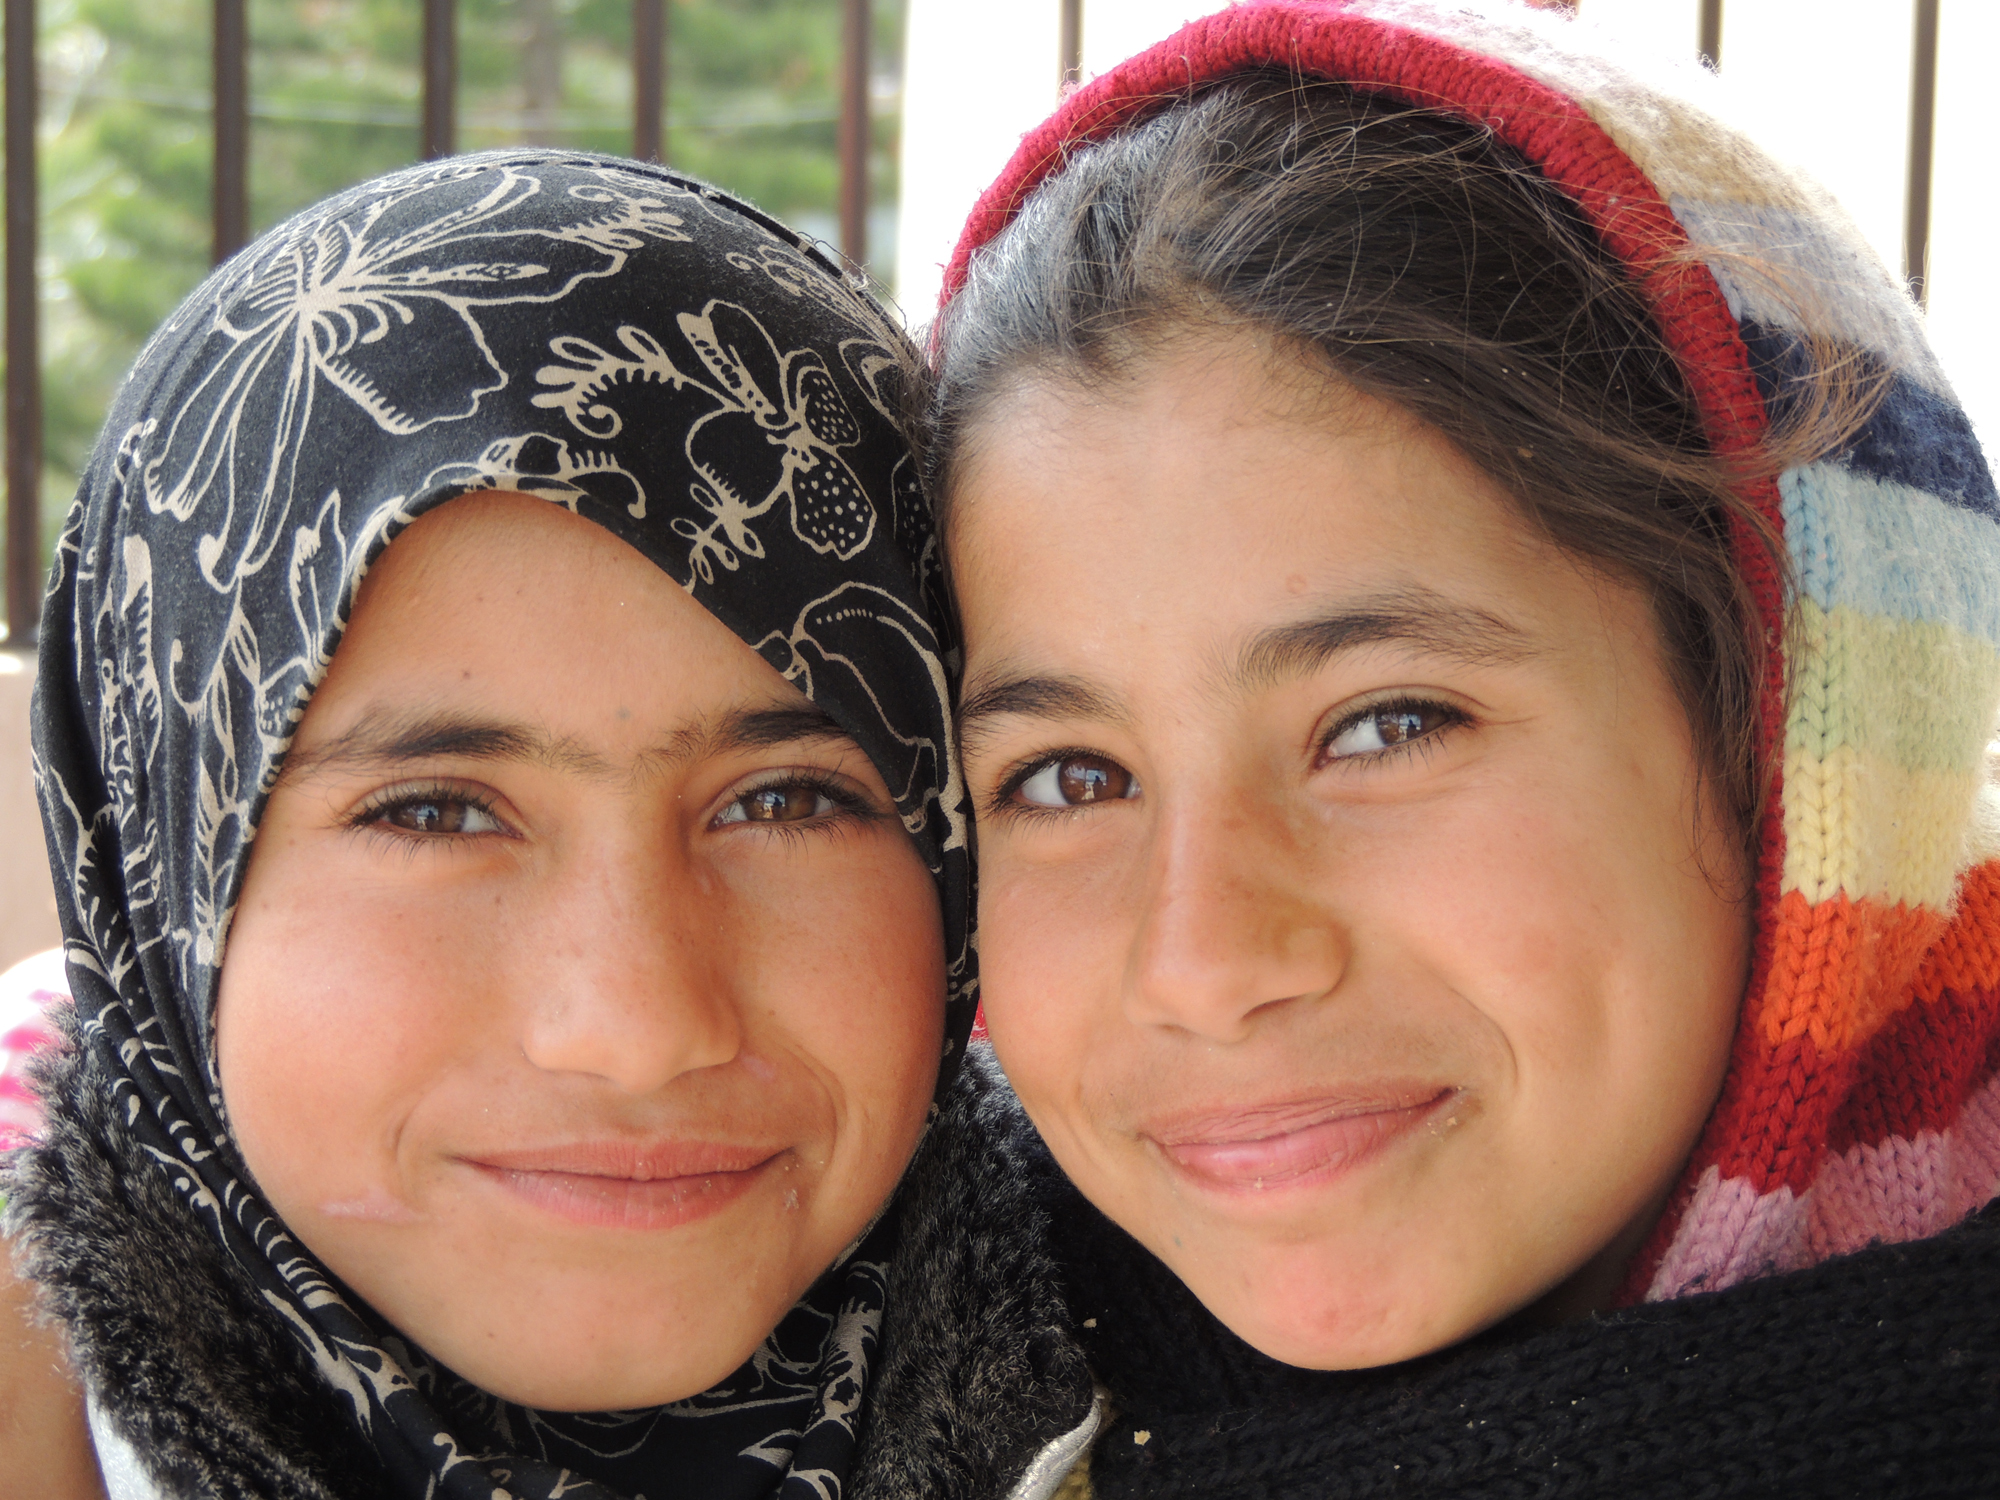 Kids Alive working to help girls in Guatemala